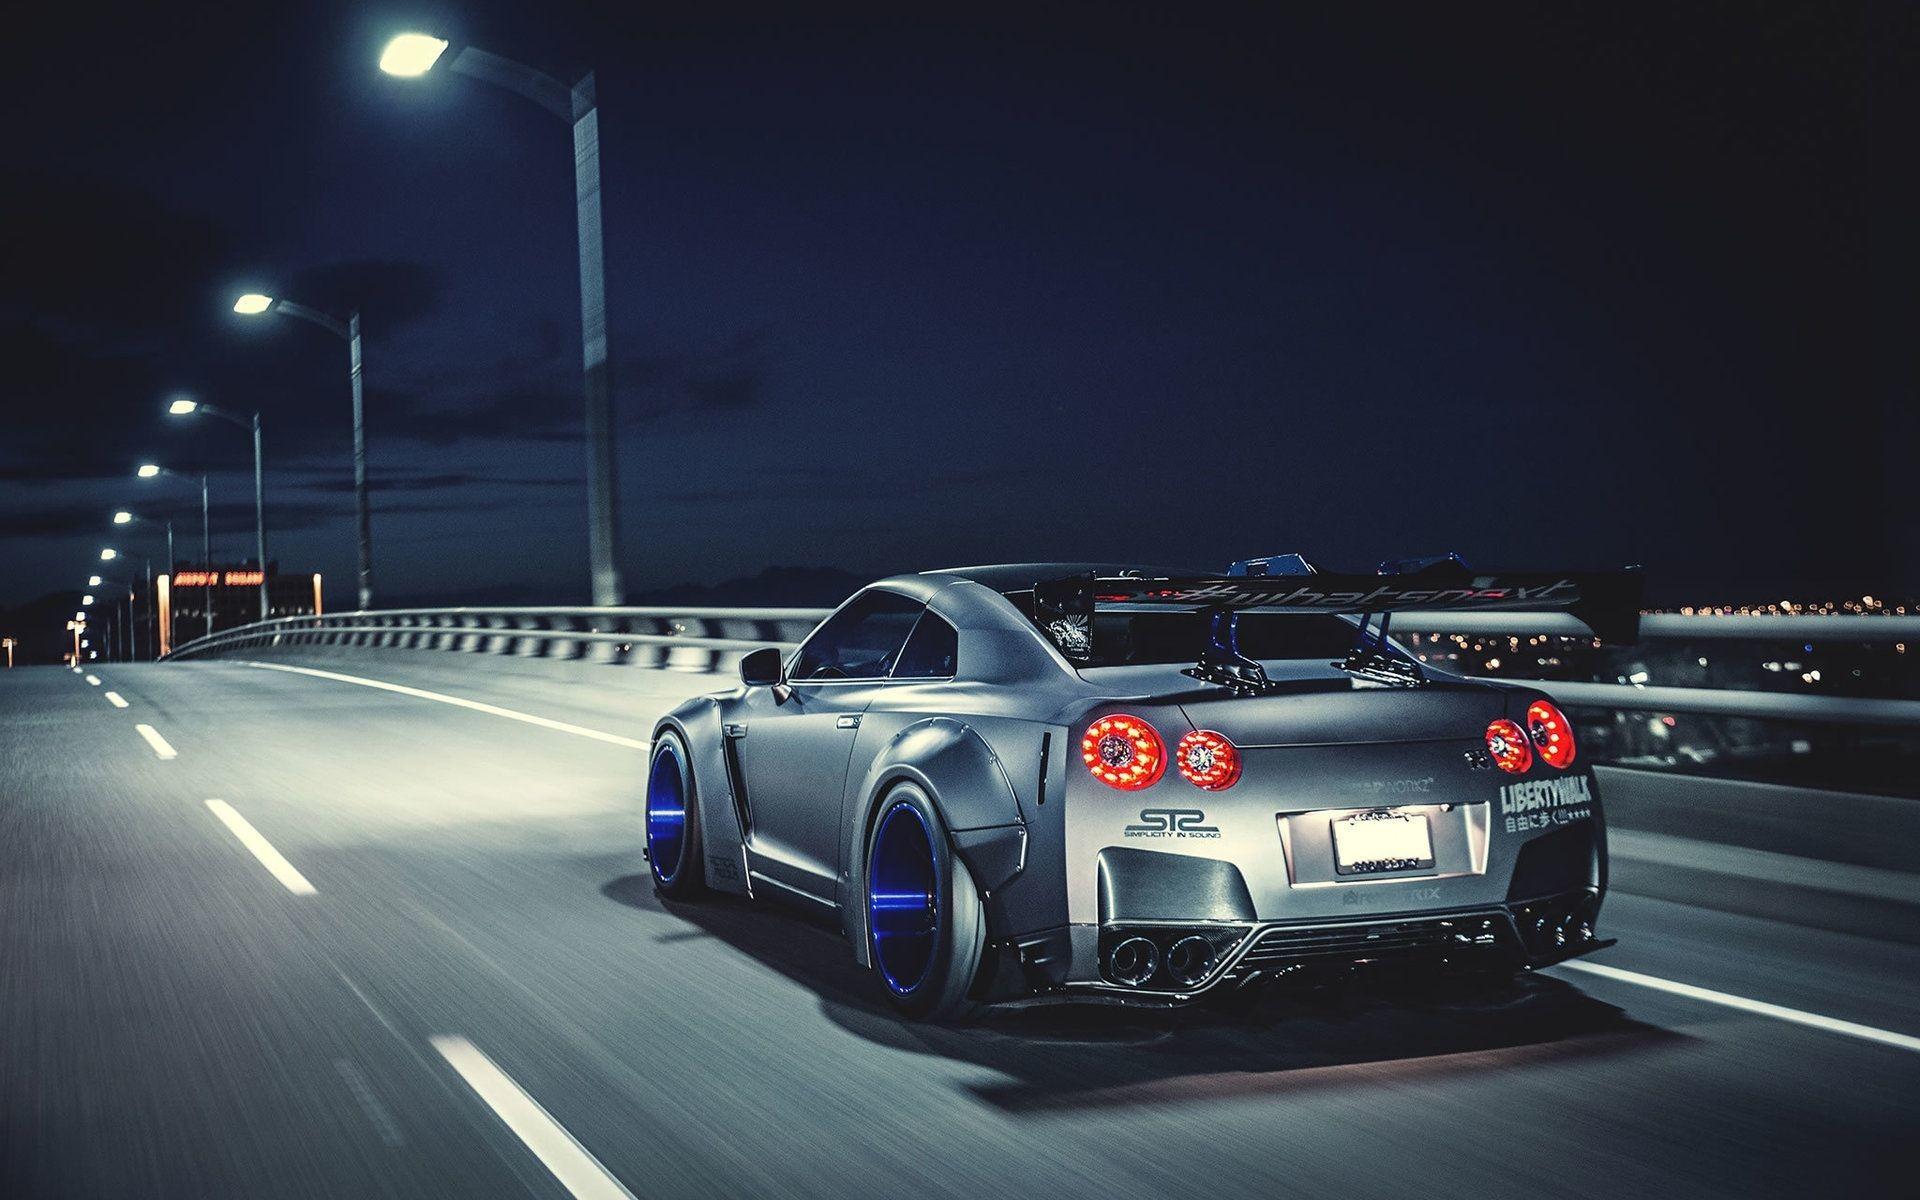 Nissan Skyline Gtr R34 Wallpaper Download – Free Wallpaper Page